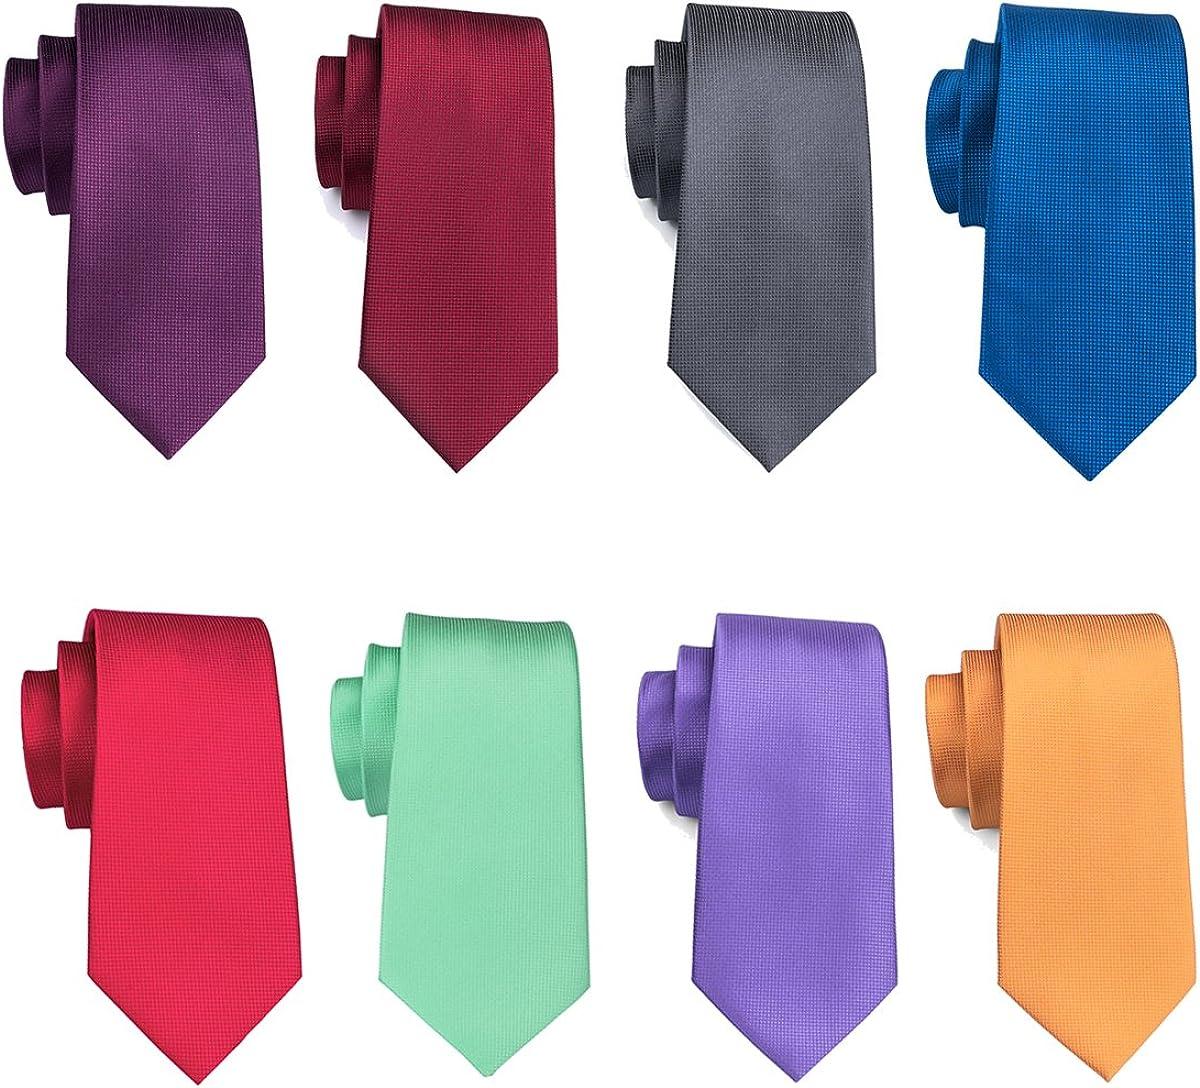 1 Blue tie 100/% silk McDonald London pure silk blu red tie damasked tie McDonald silk tie original McDonald tie pure silk tie